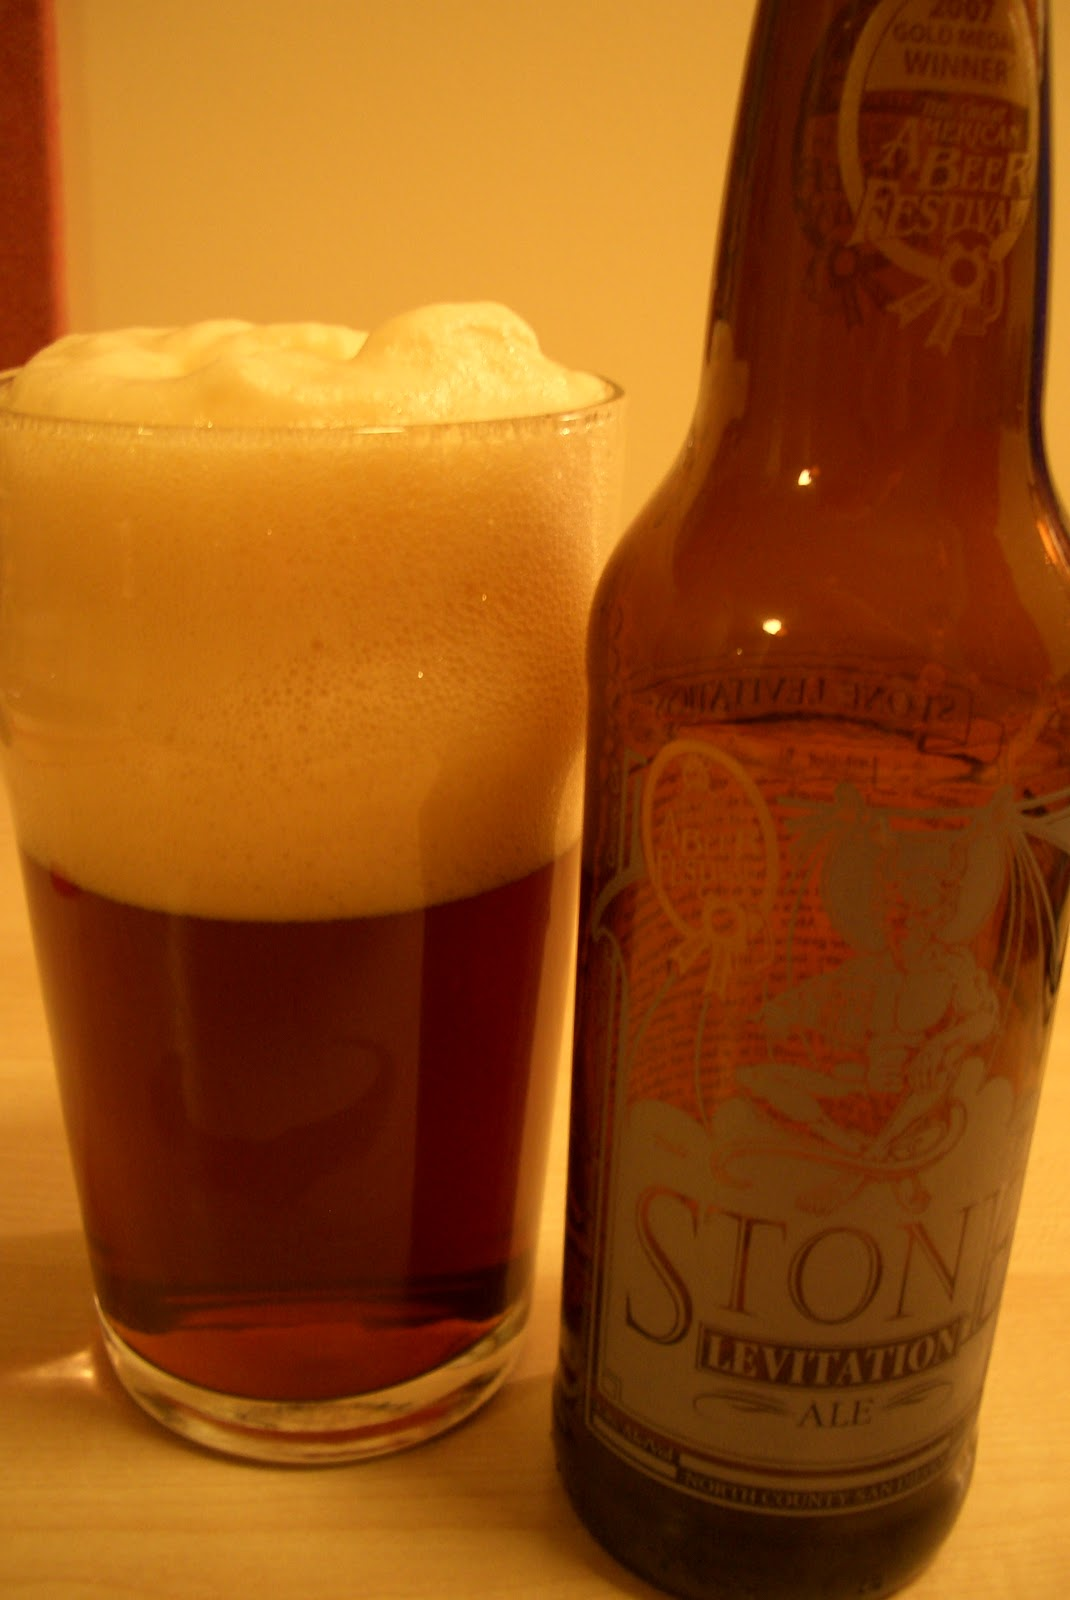 Stone Levitation Ale : Ιστορίες από το Στύλο Μπυροπαρουσίαση stone